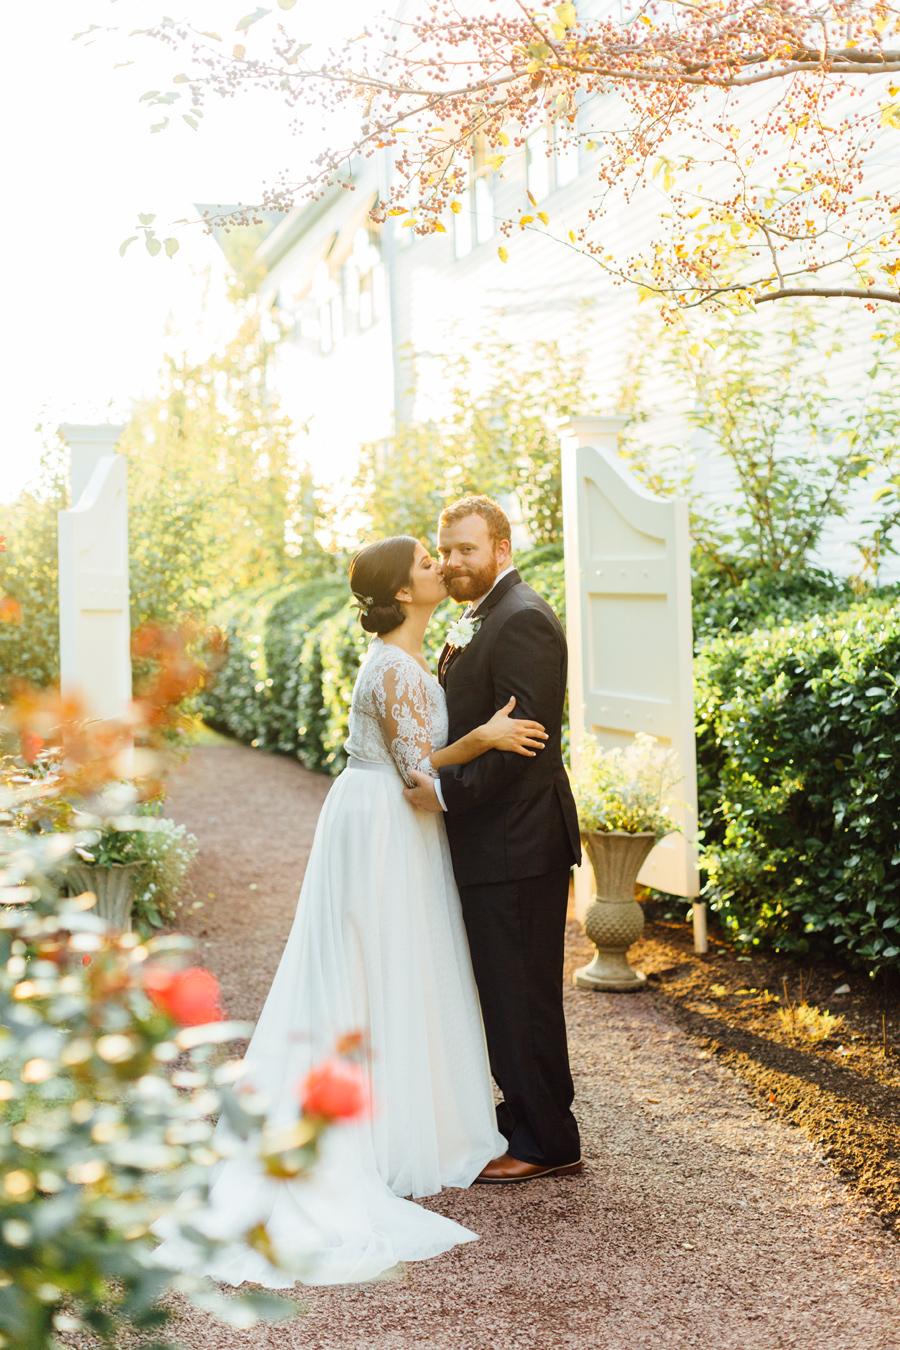 the-inn-at-leola-wedding-lancaster-pennsylvania-wedding-photographer-rebeka-viola-photograhy (84).jpg